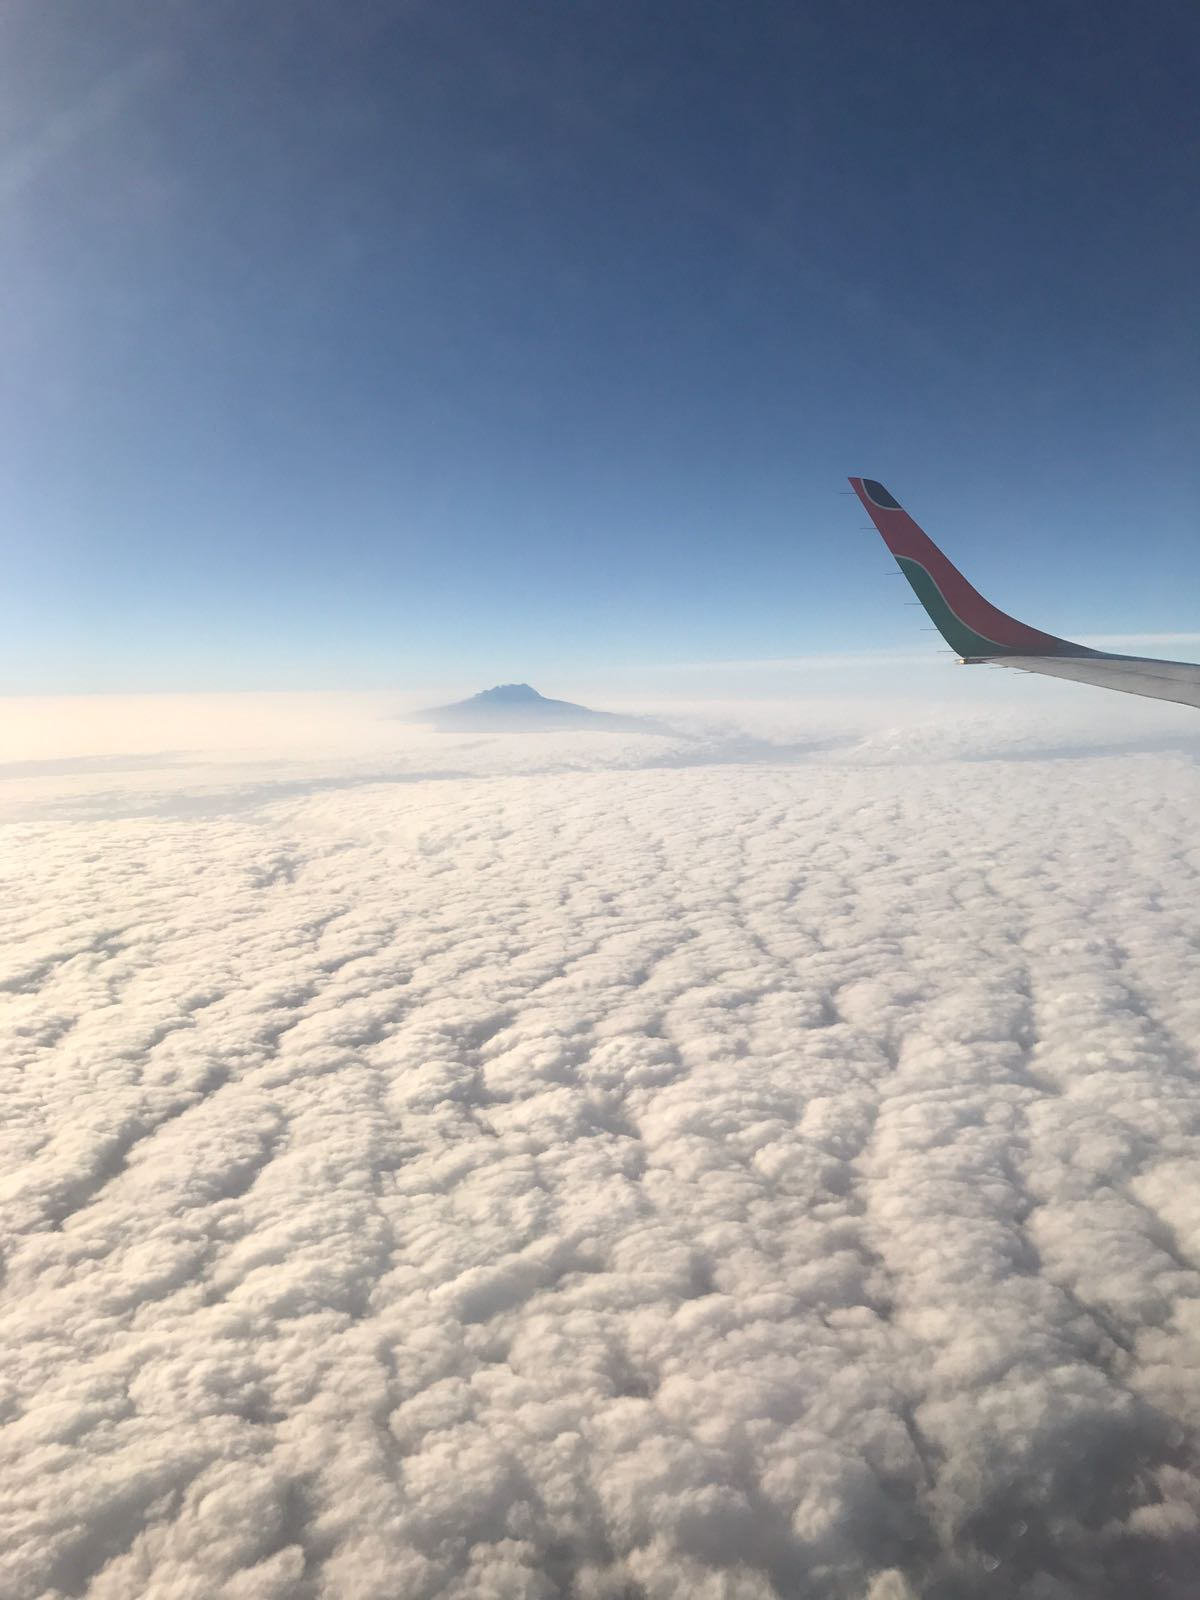 Kilimanjaro aerial view